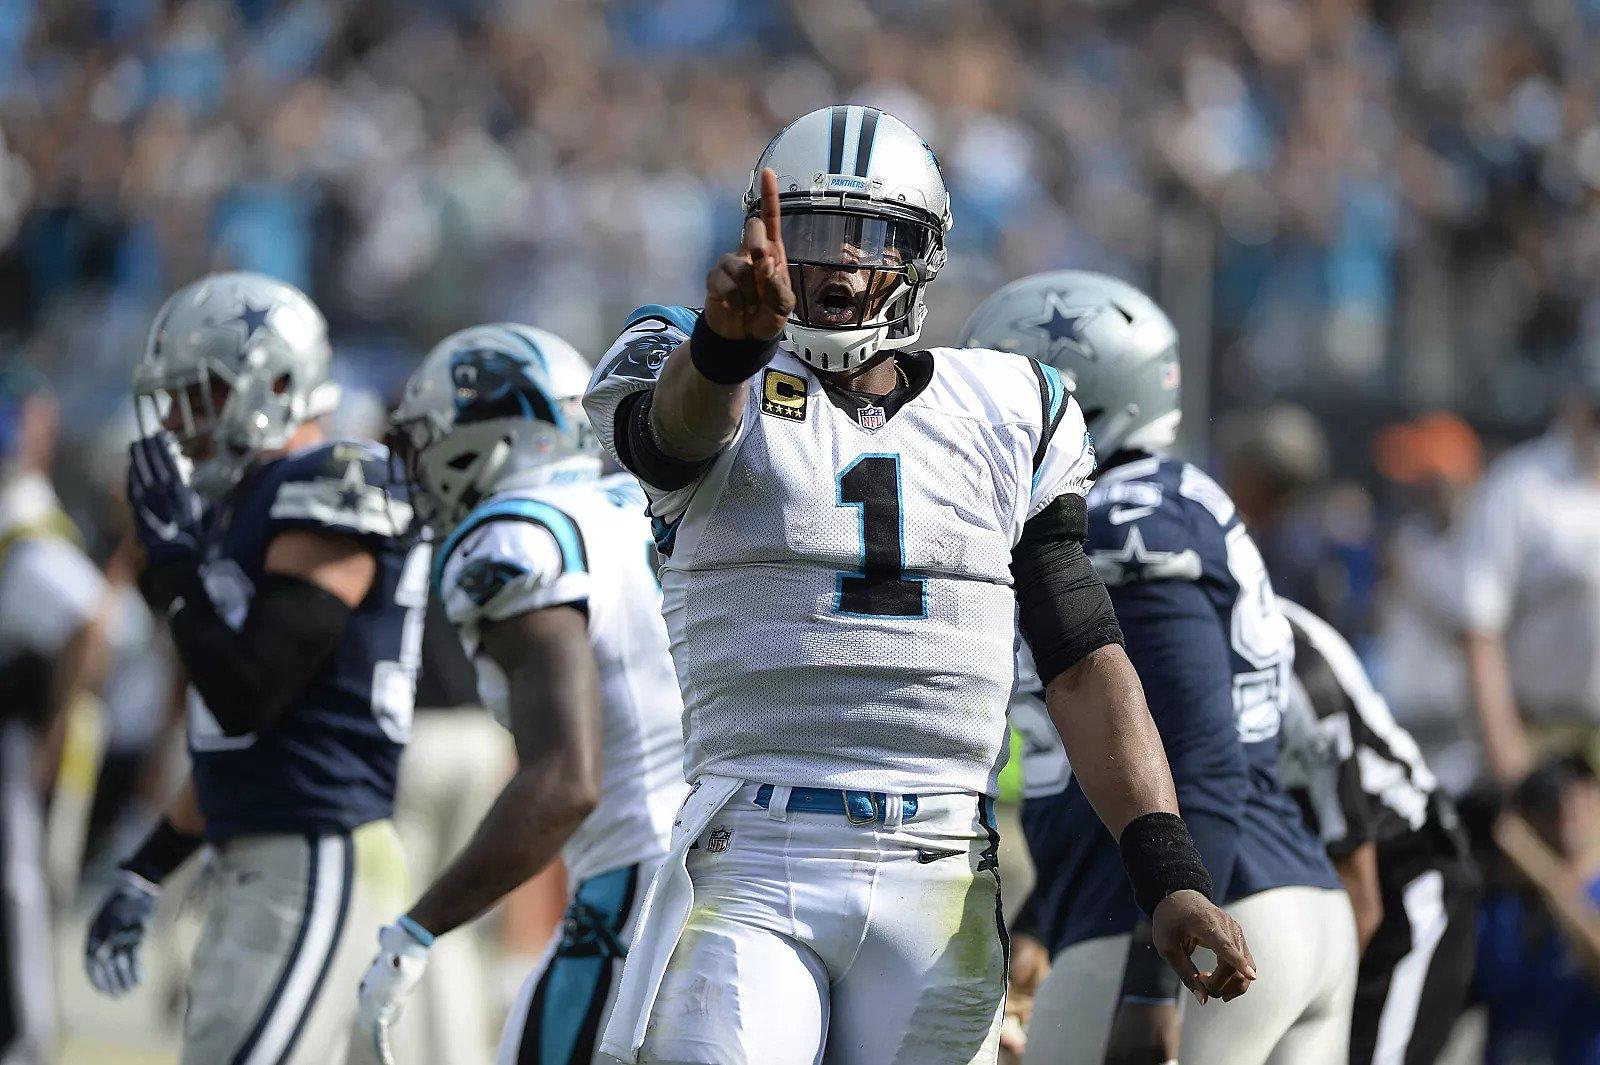 [NFL] Week 1: Panthers vecchio stile (Dallas Cowboys vs Carolina Panthers 16-8)